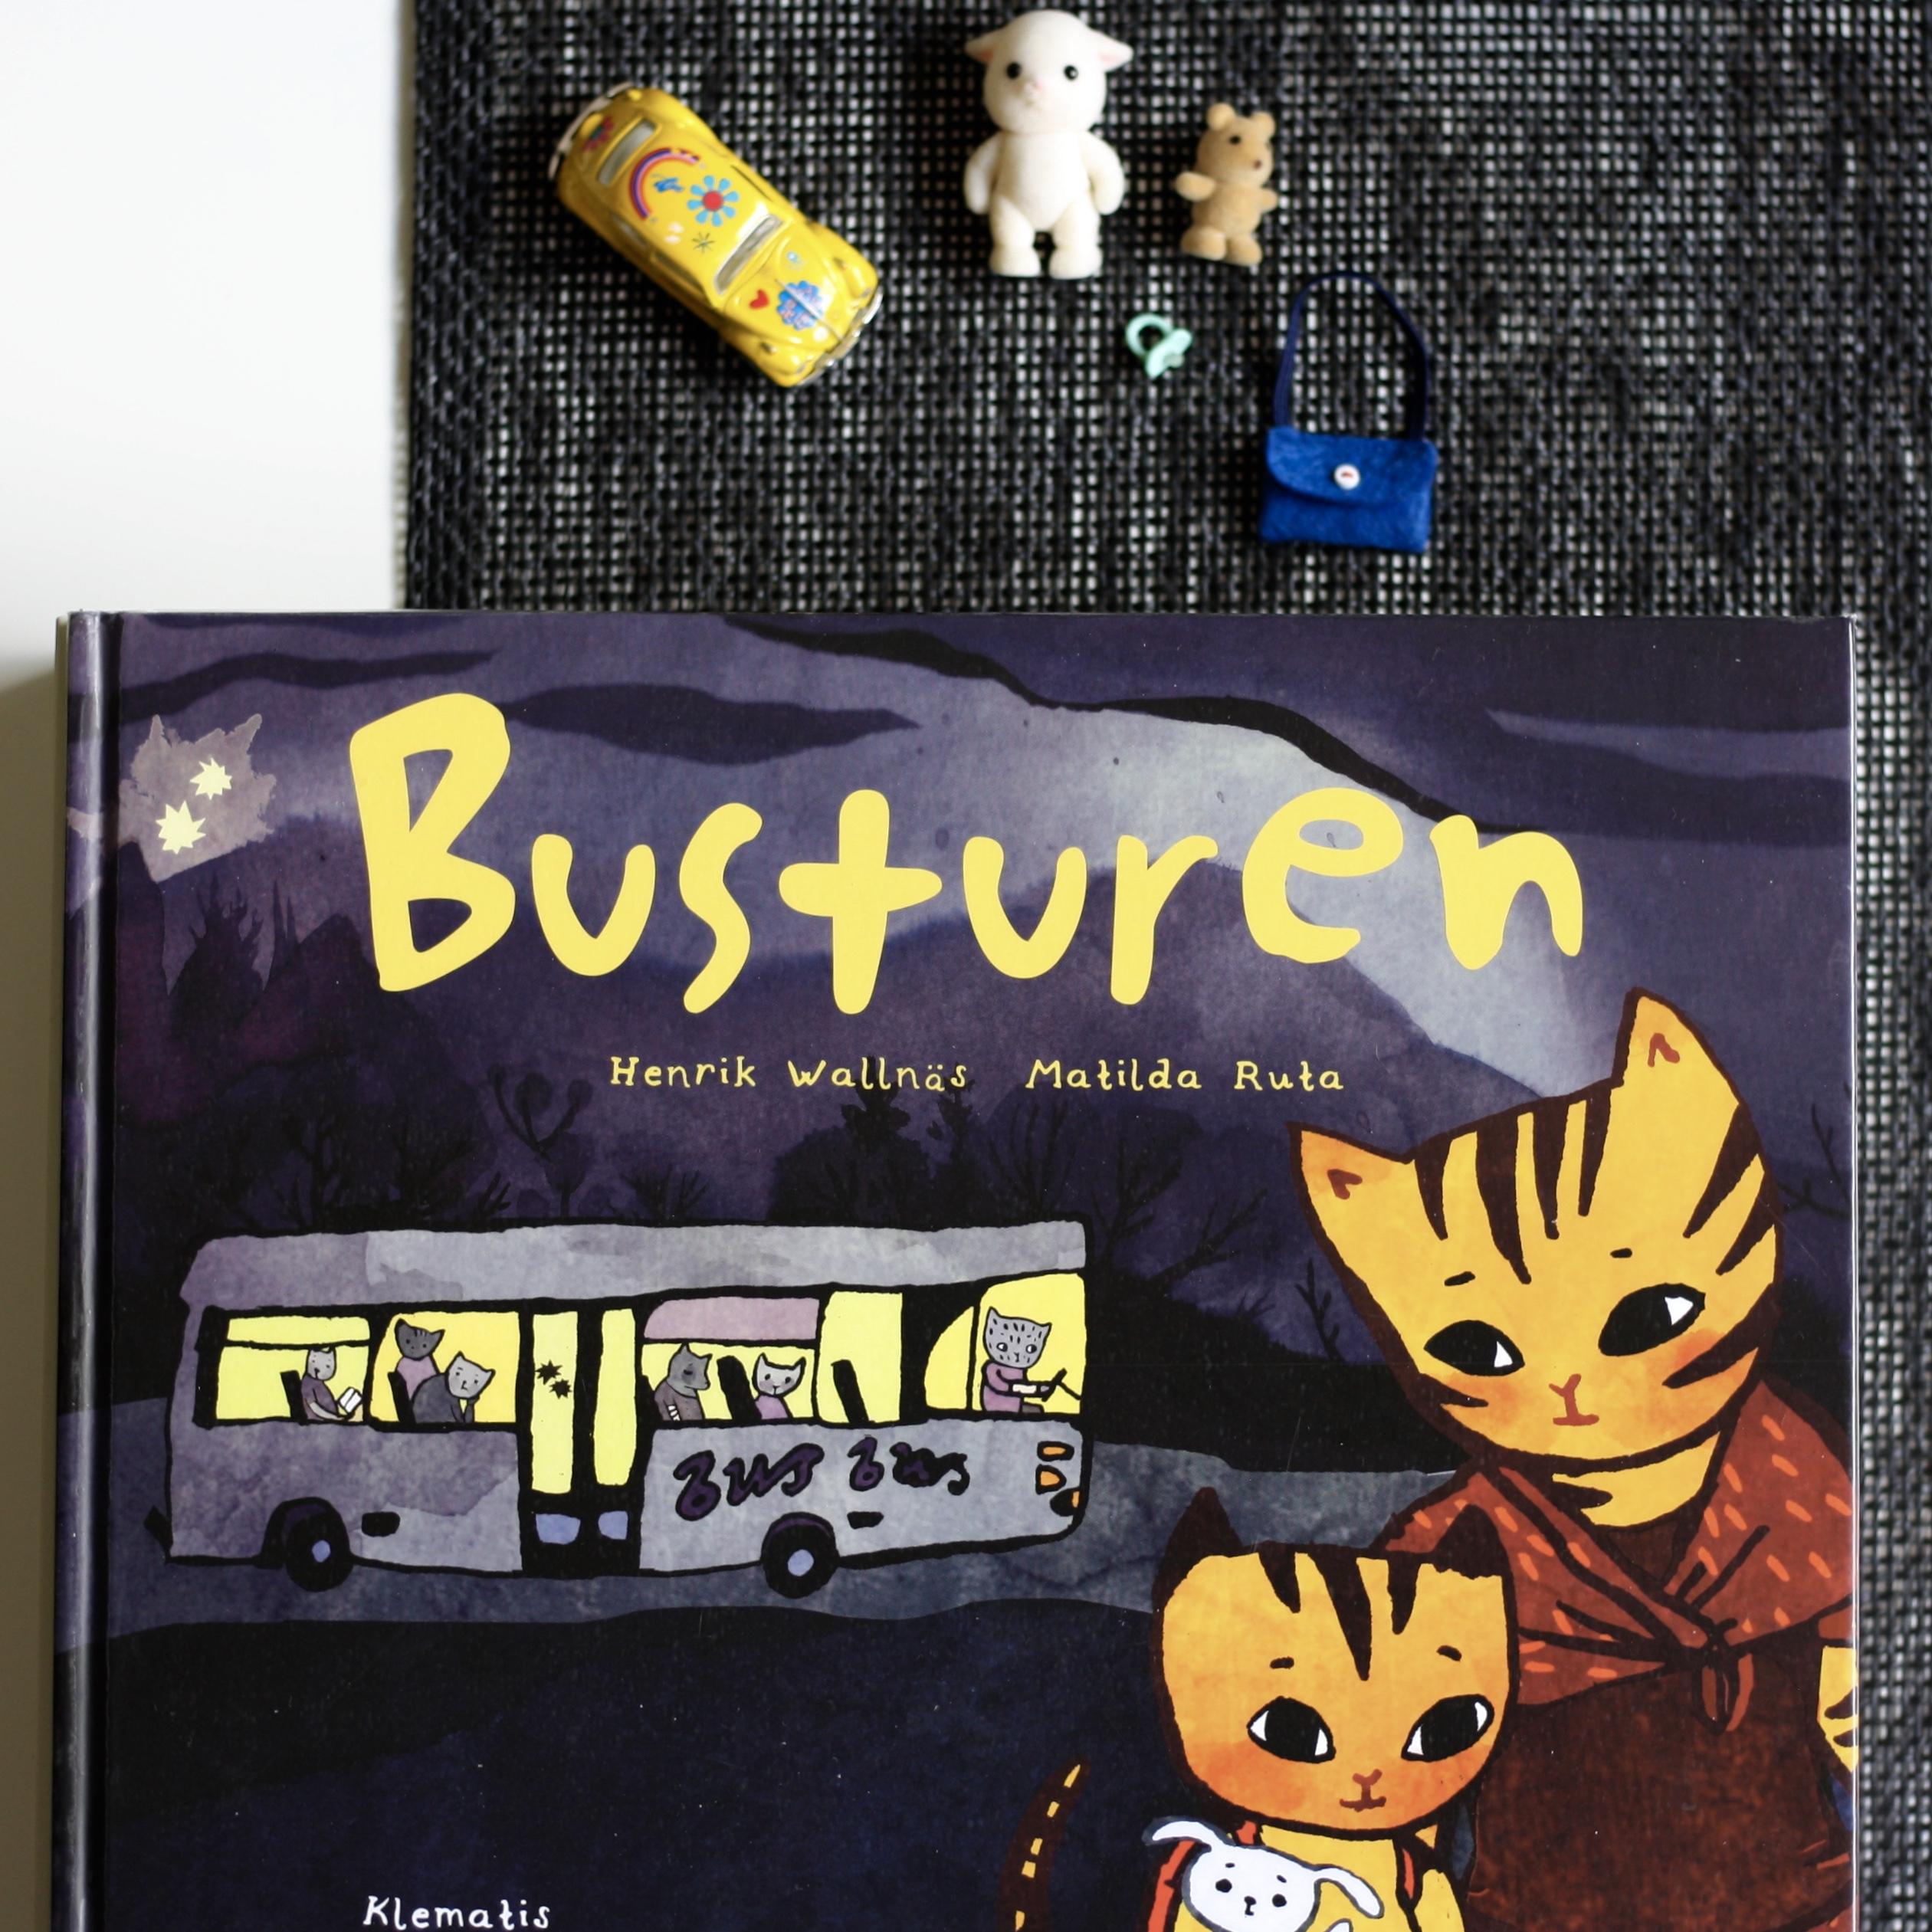 Busturen, Henrik Wallnäs, Matilda ruta, bogoplevelsen